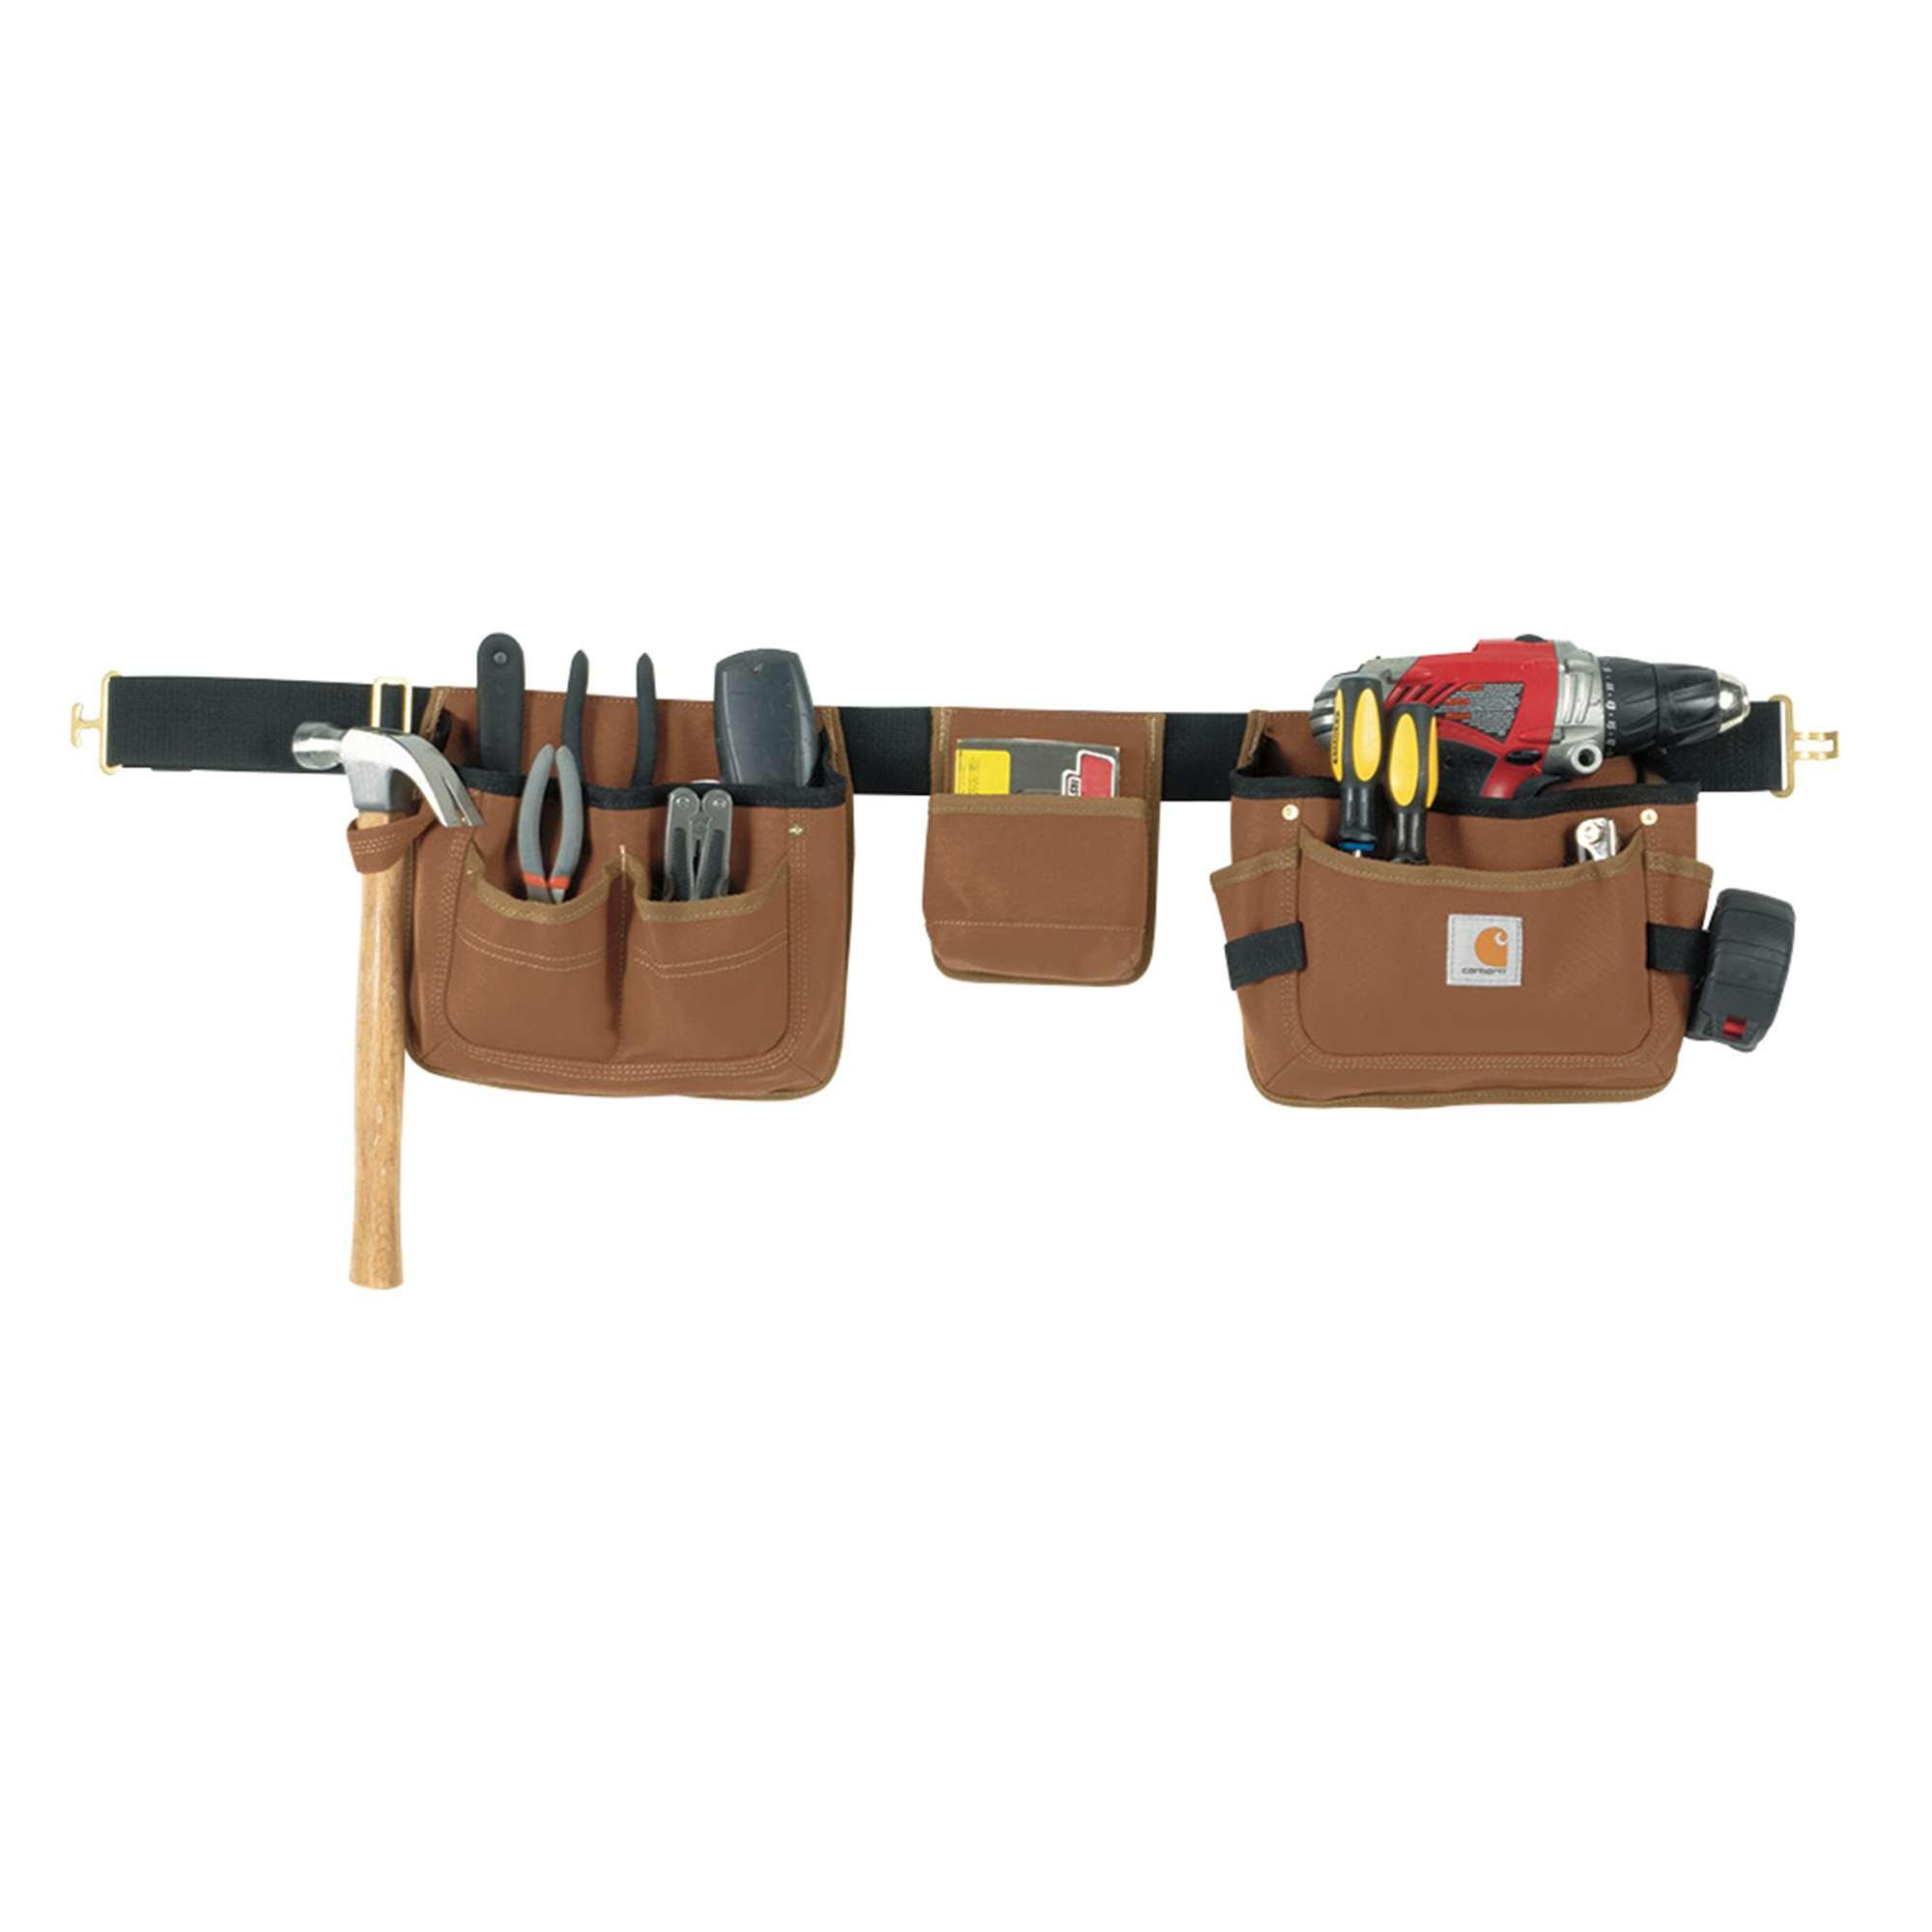 Carhartt Standard Tool Belt Keep Everything Close At Hand